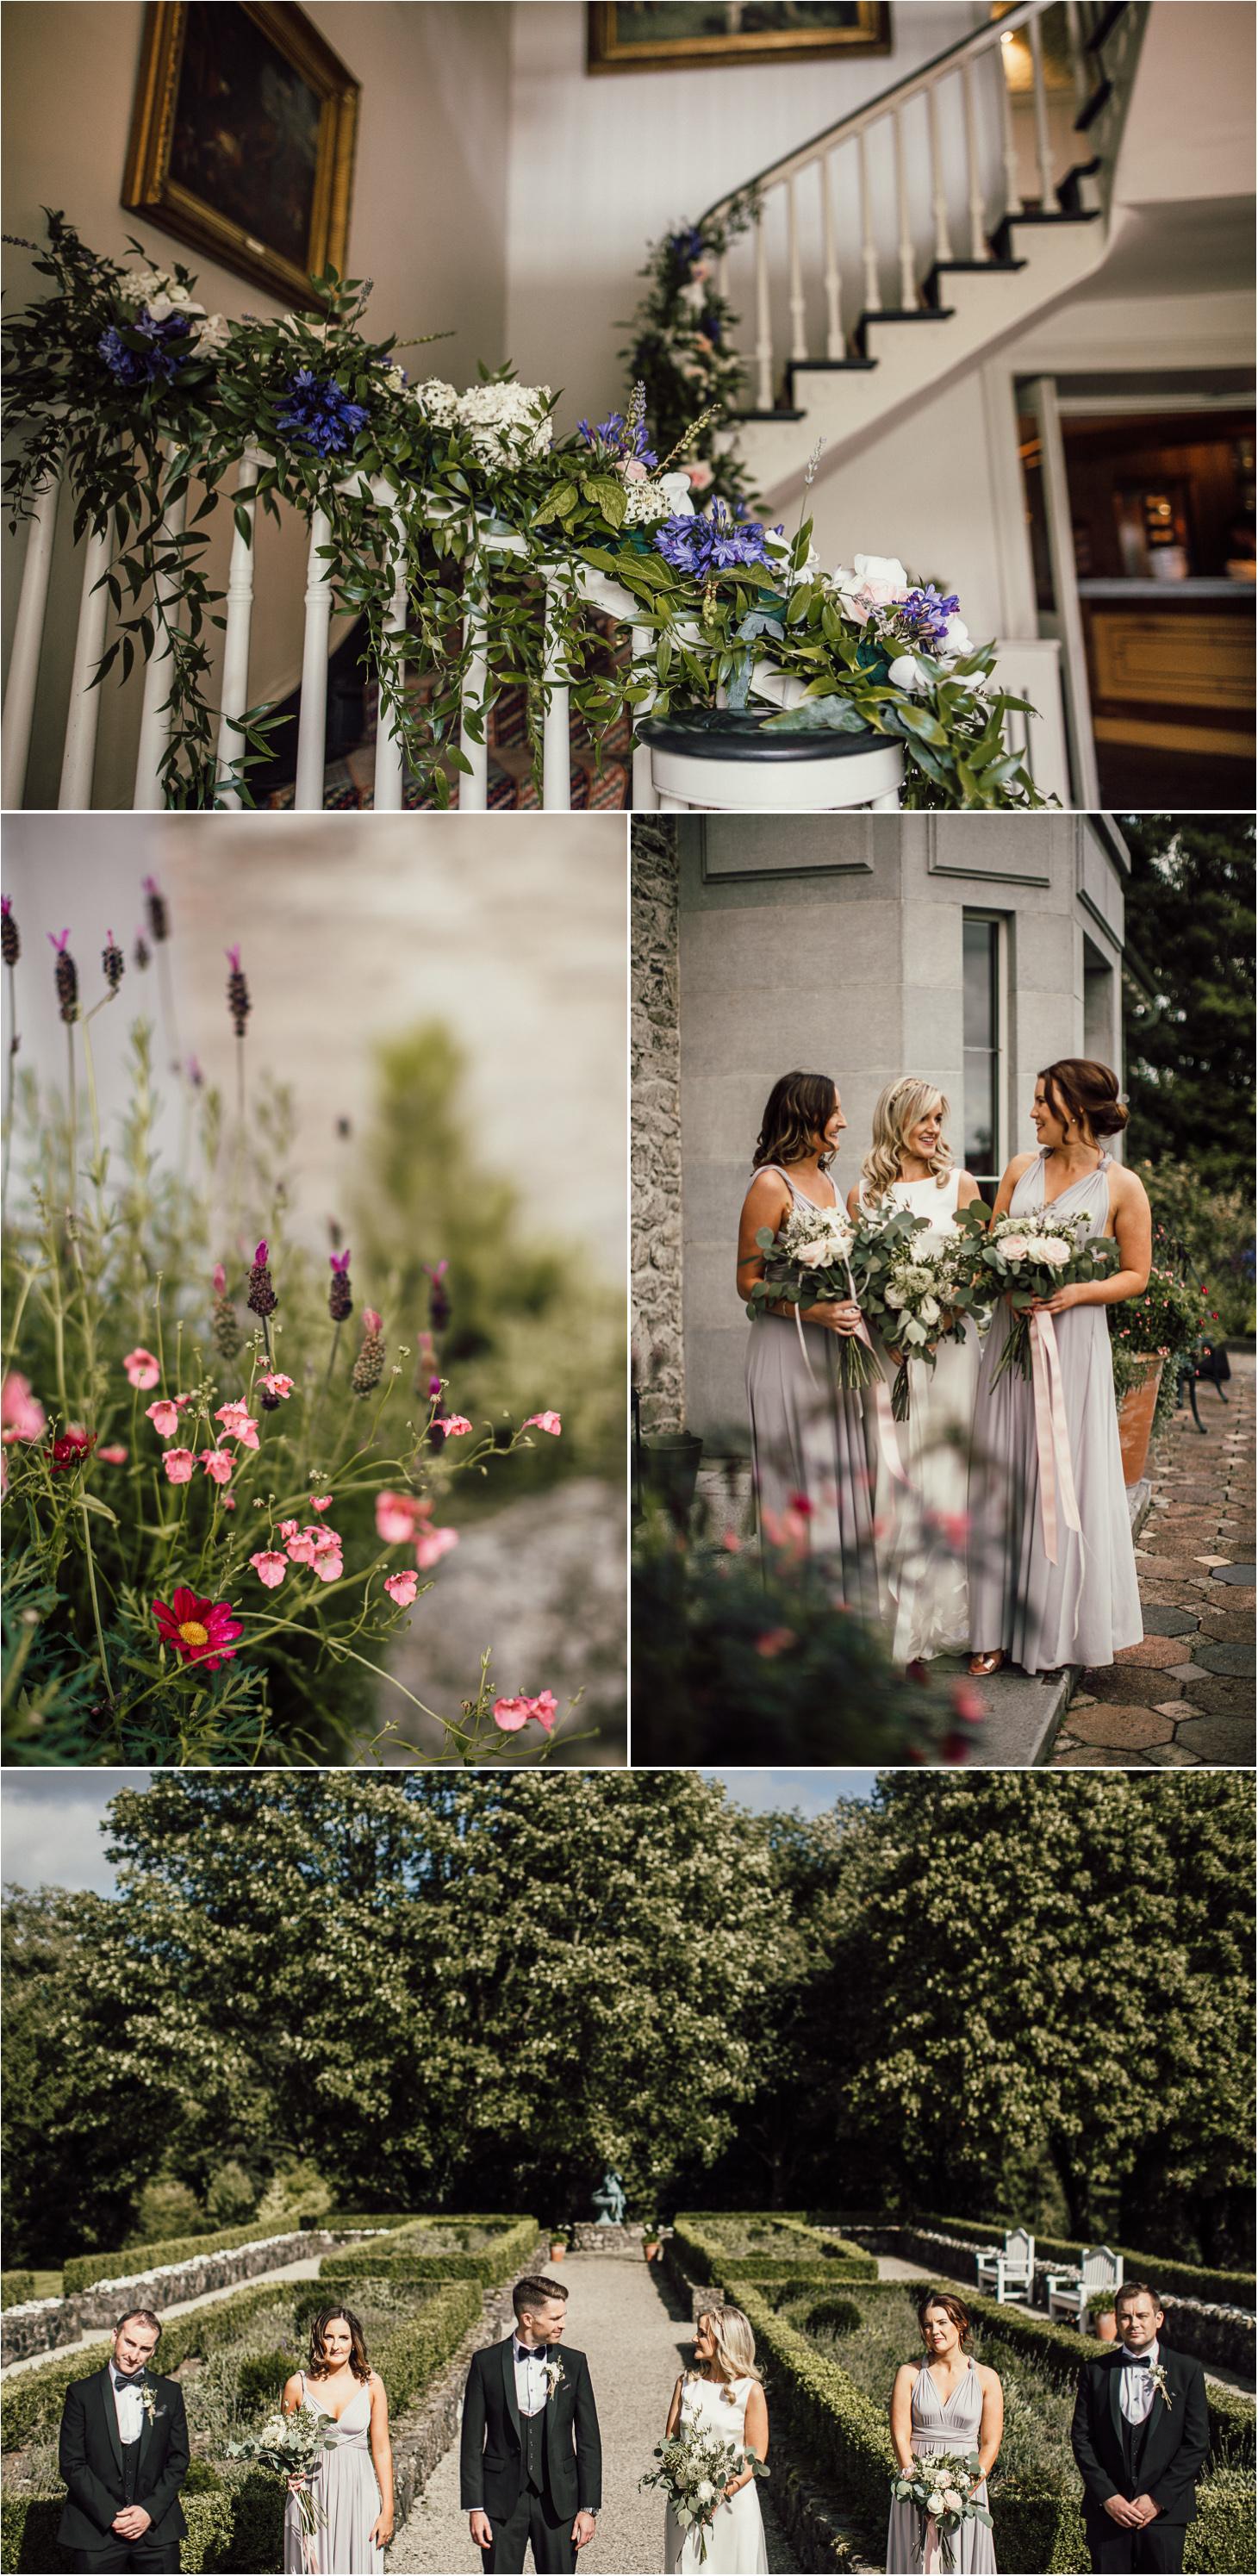 Virgina Lodge Photography. darren fitzpatrick. Wedding.13